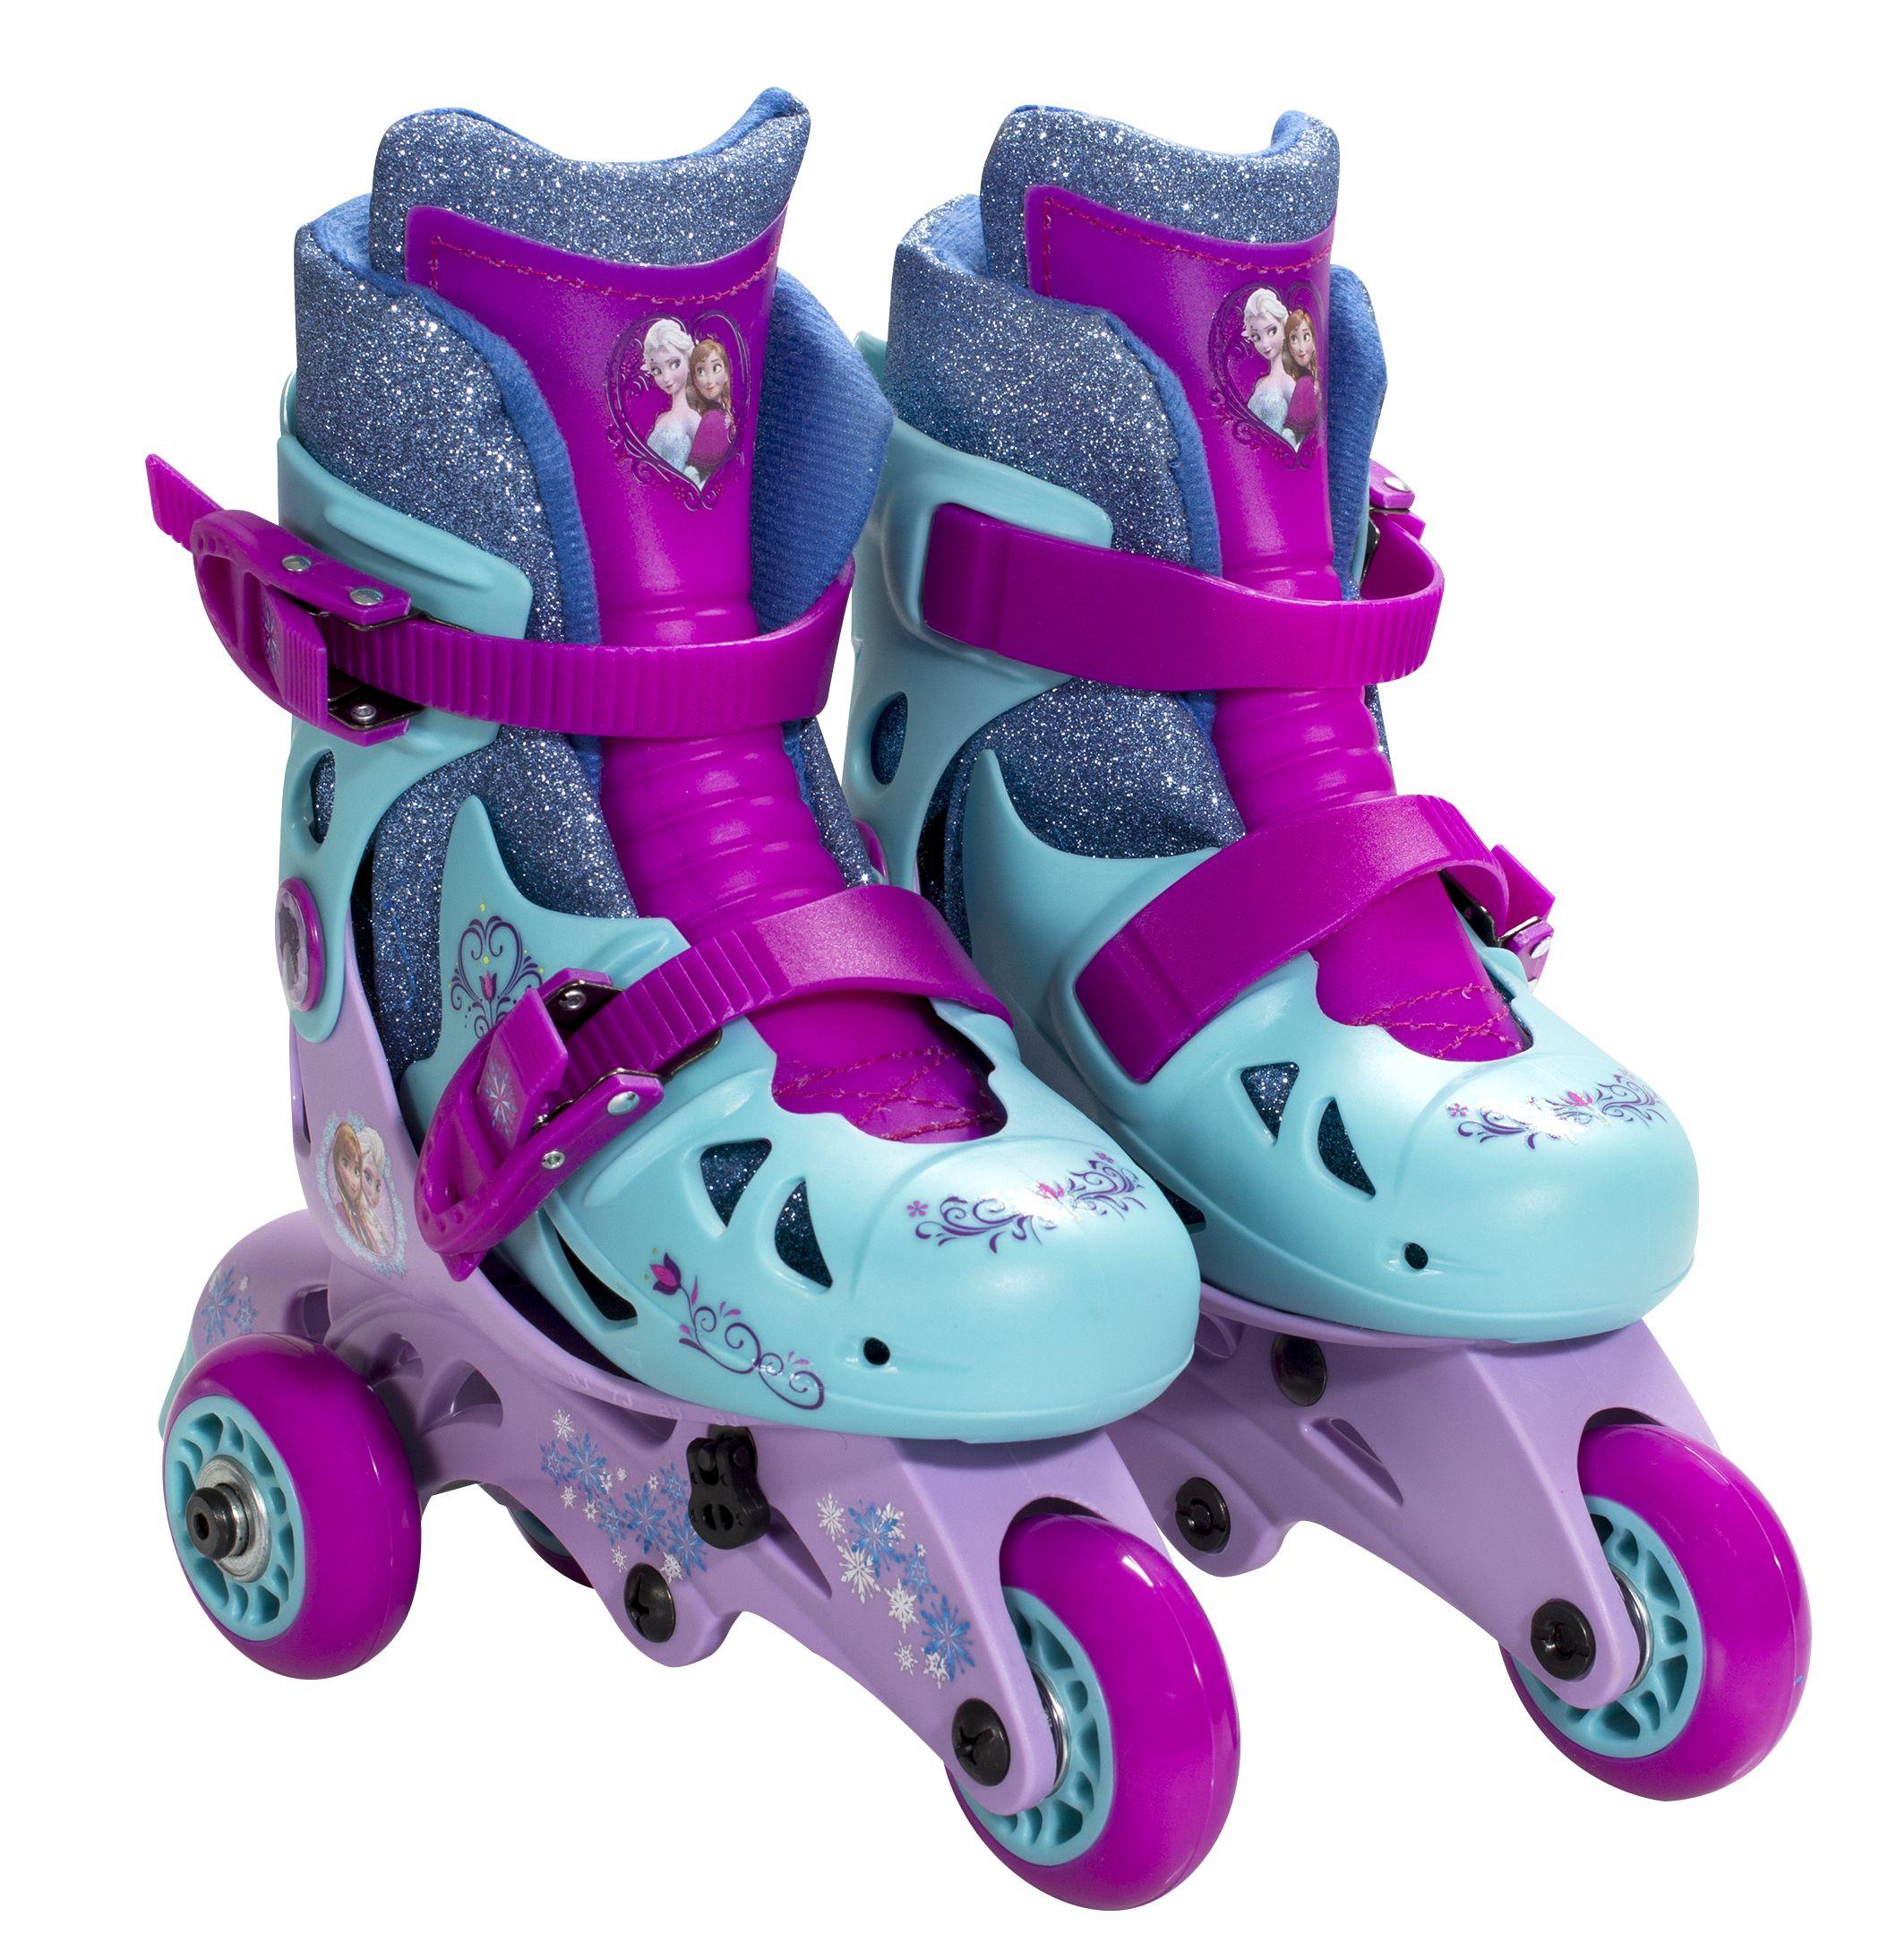 Frozen roller skates walmart - Convertible Glitter 2 In 1 Skates 39 99 Available At Target Frozen